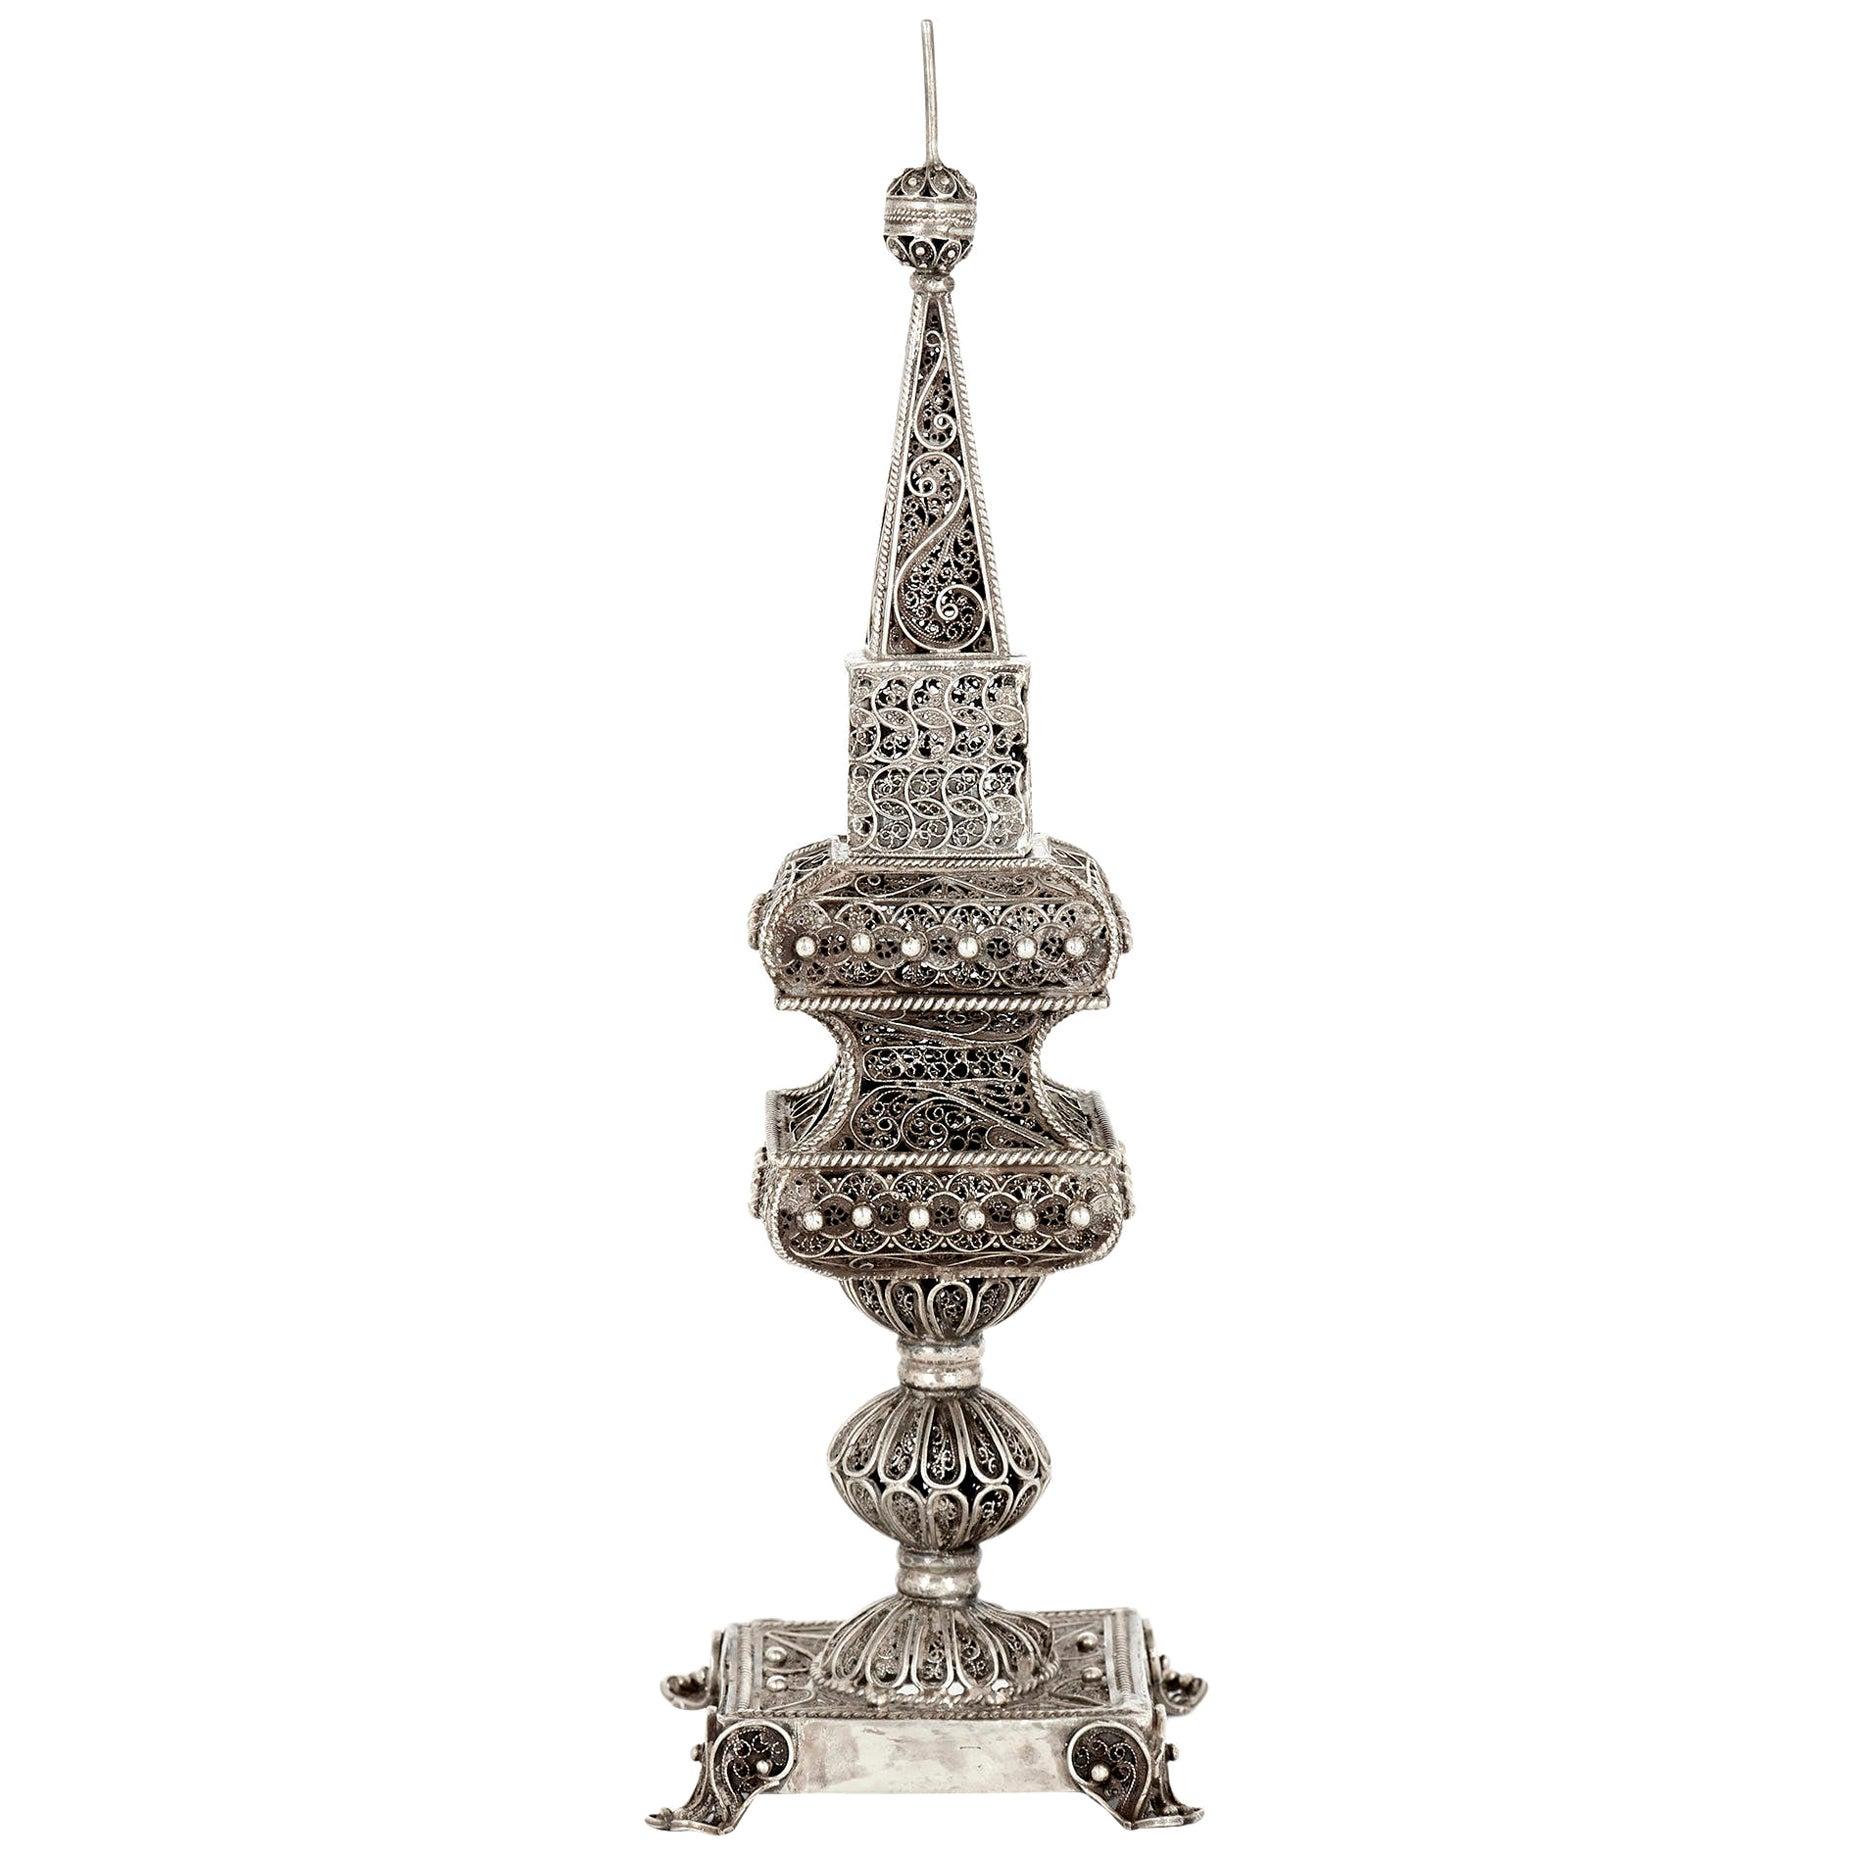 Silver Filigree Judaica Spice Tower